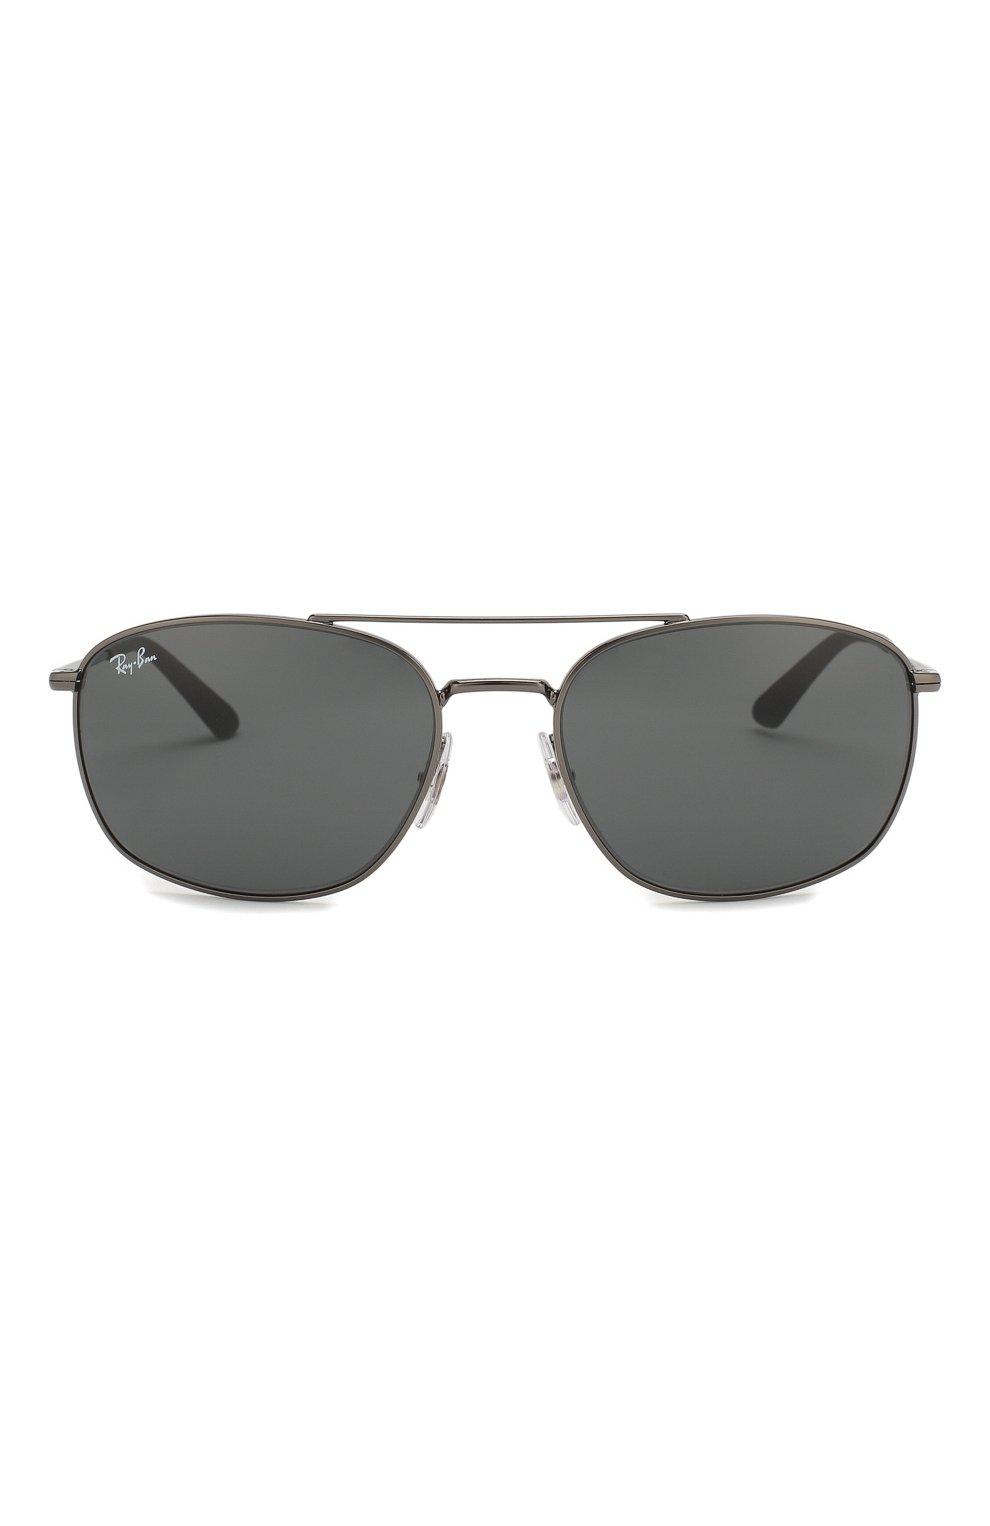 Мужские солнцезащитные очки RAY-BAN темно-серого цвета, арт. 3654-004/87   Фото 3